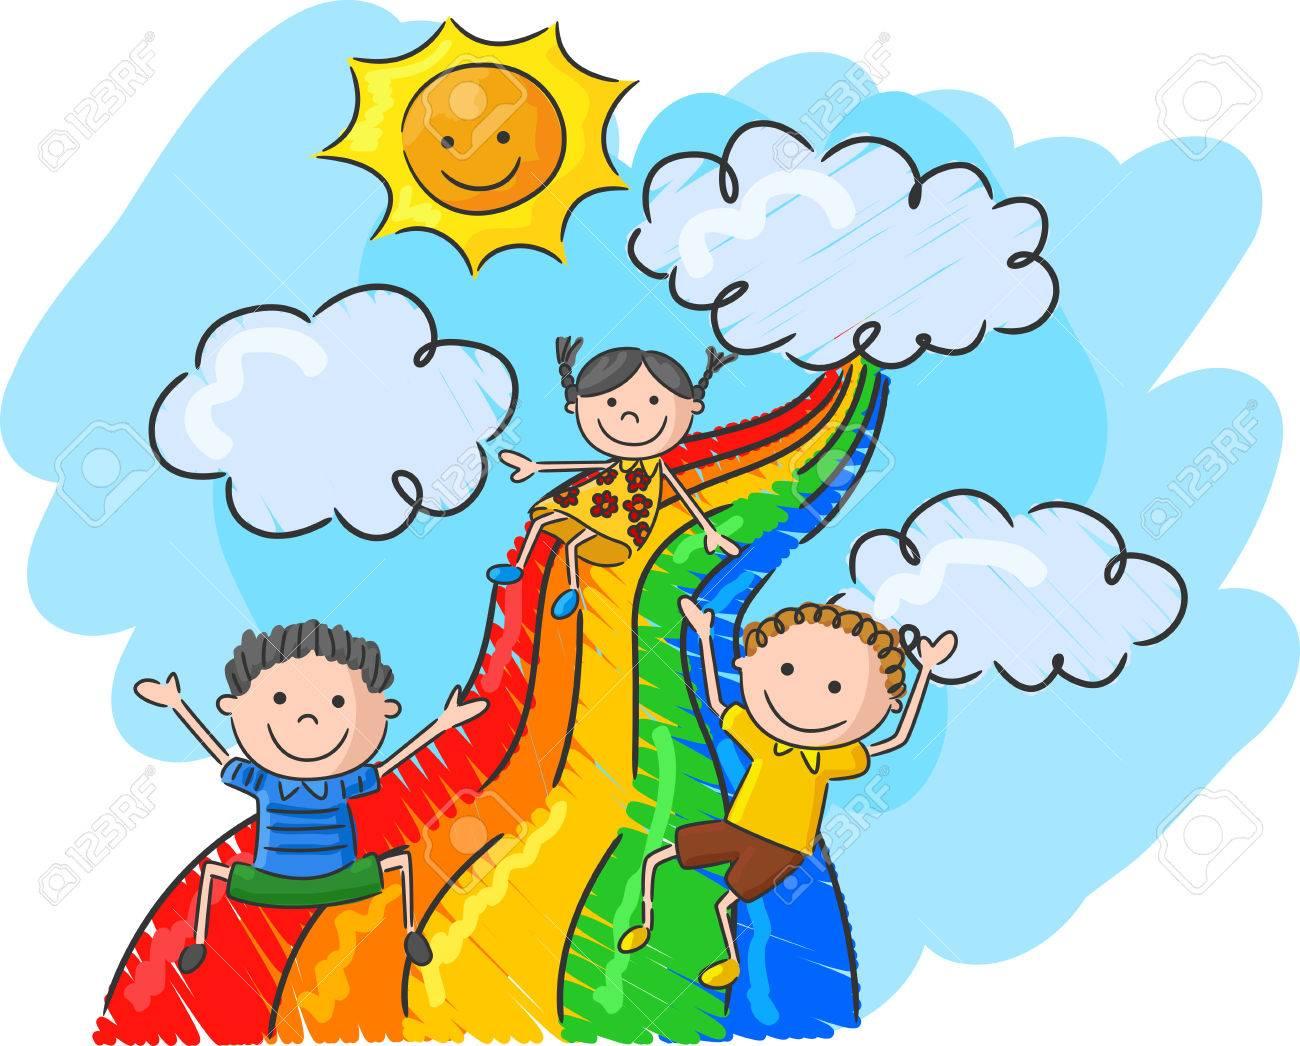 Cartoon little kids playing slide rainbow - 45091423